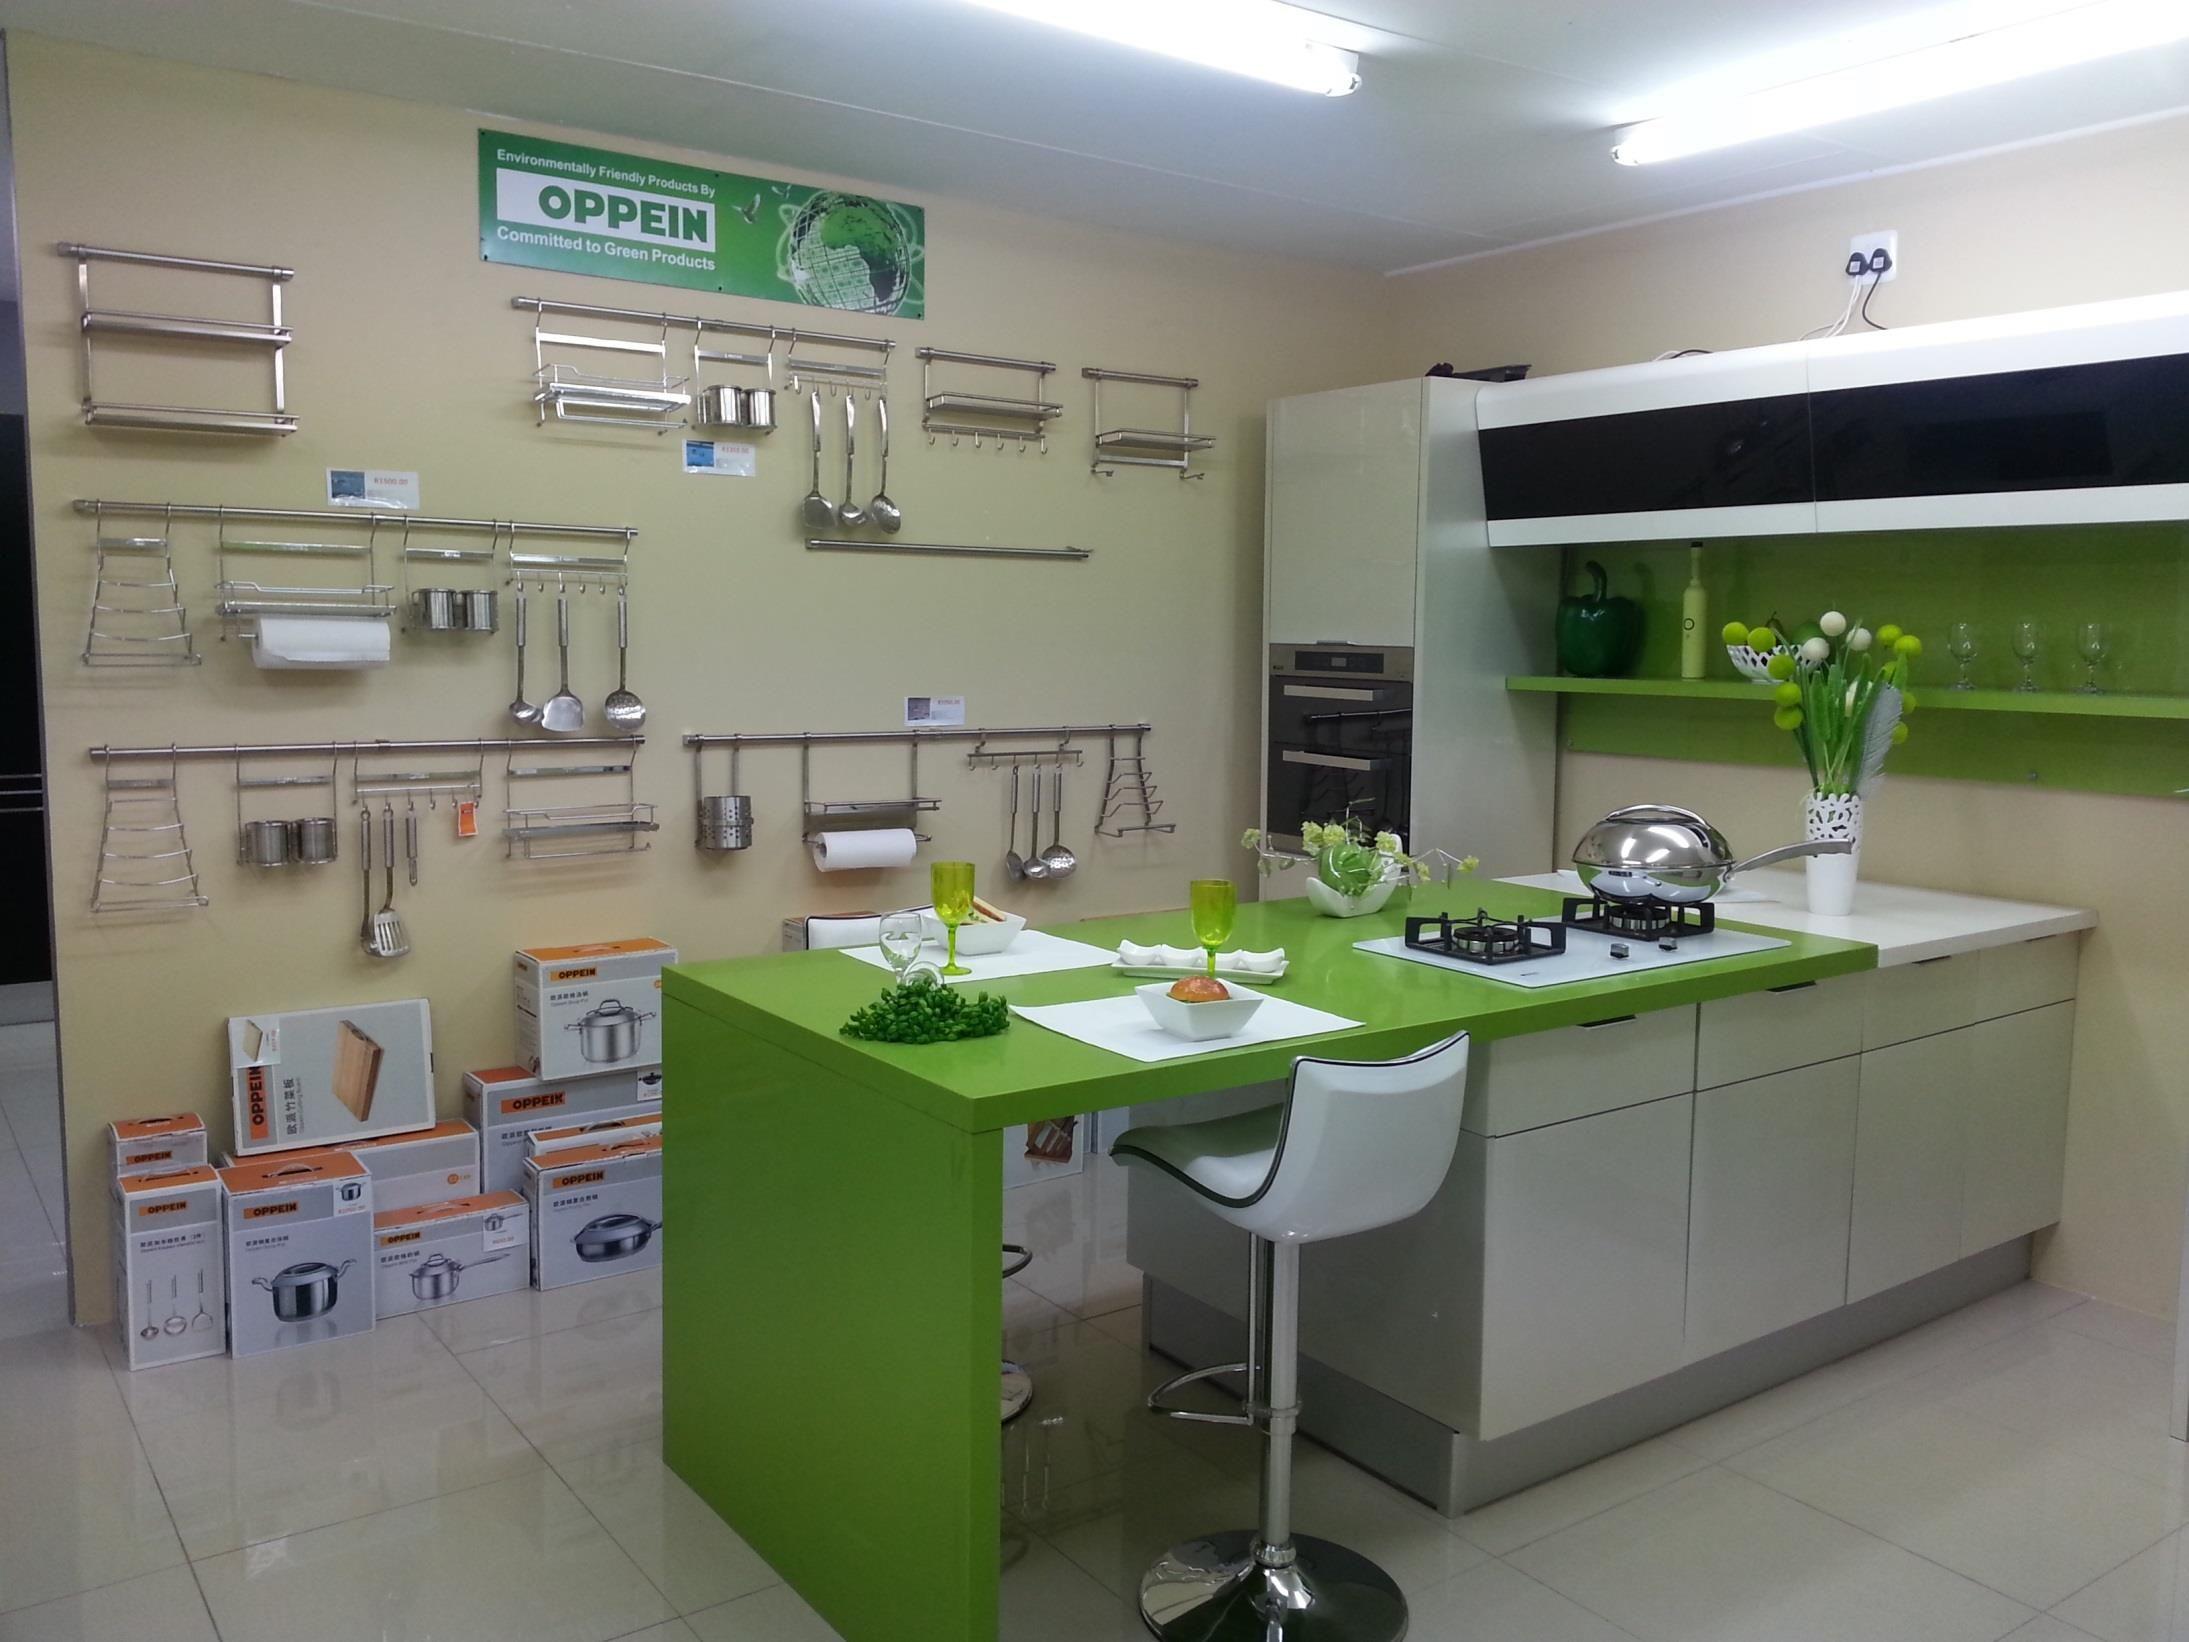 china oppein green acrylic kitchen cabinet design from oppeinhome rh pinterest com